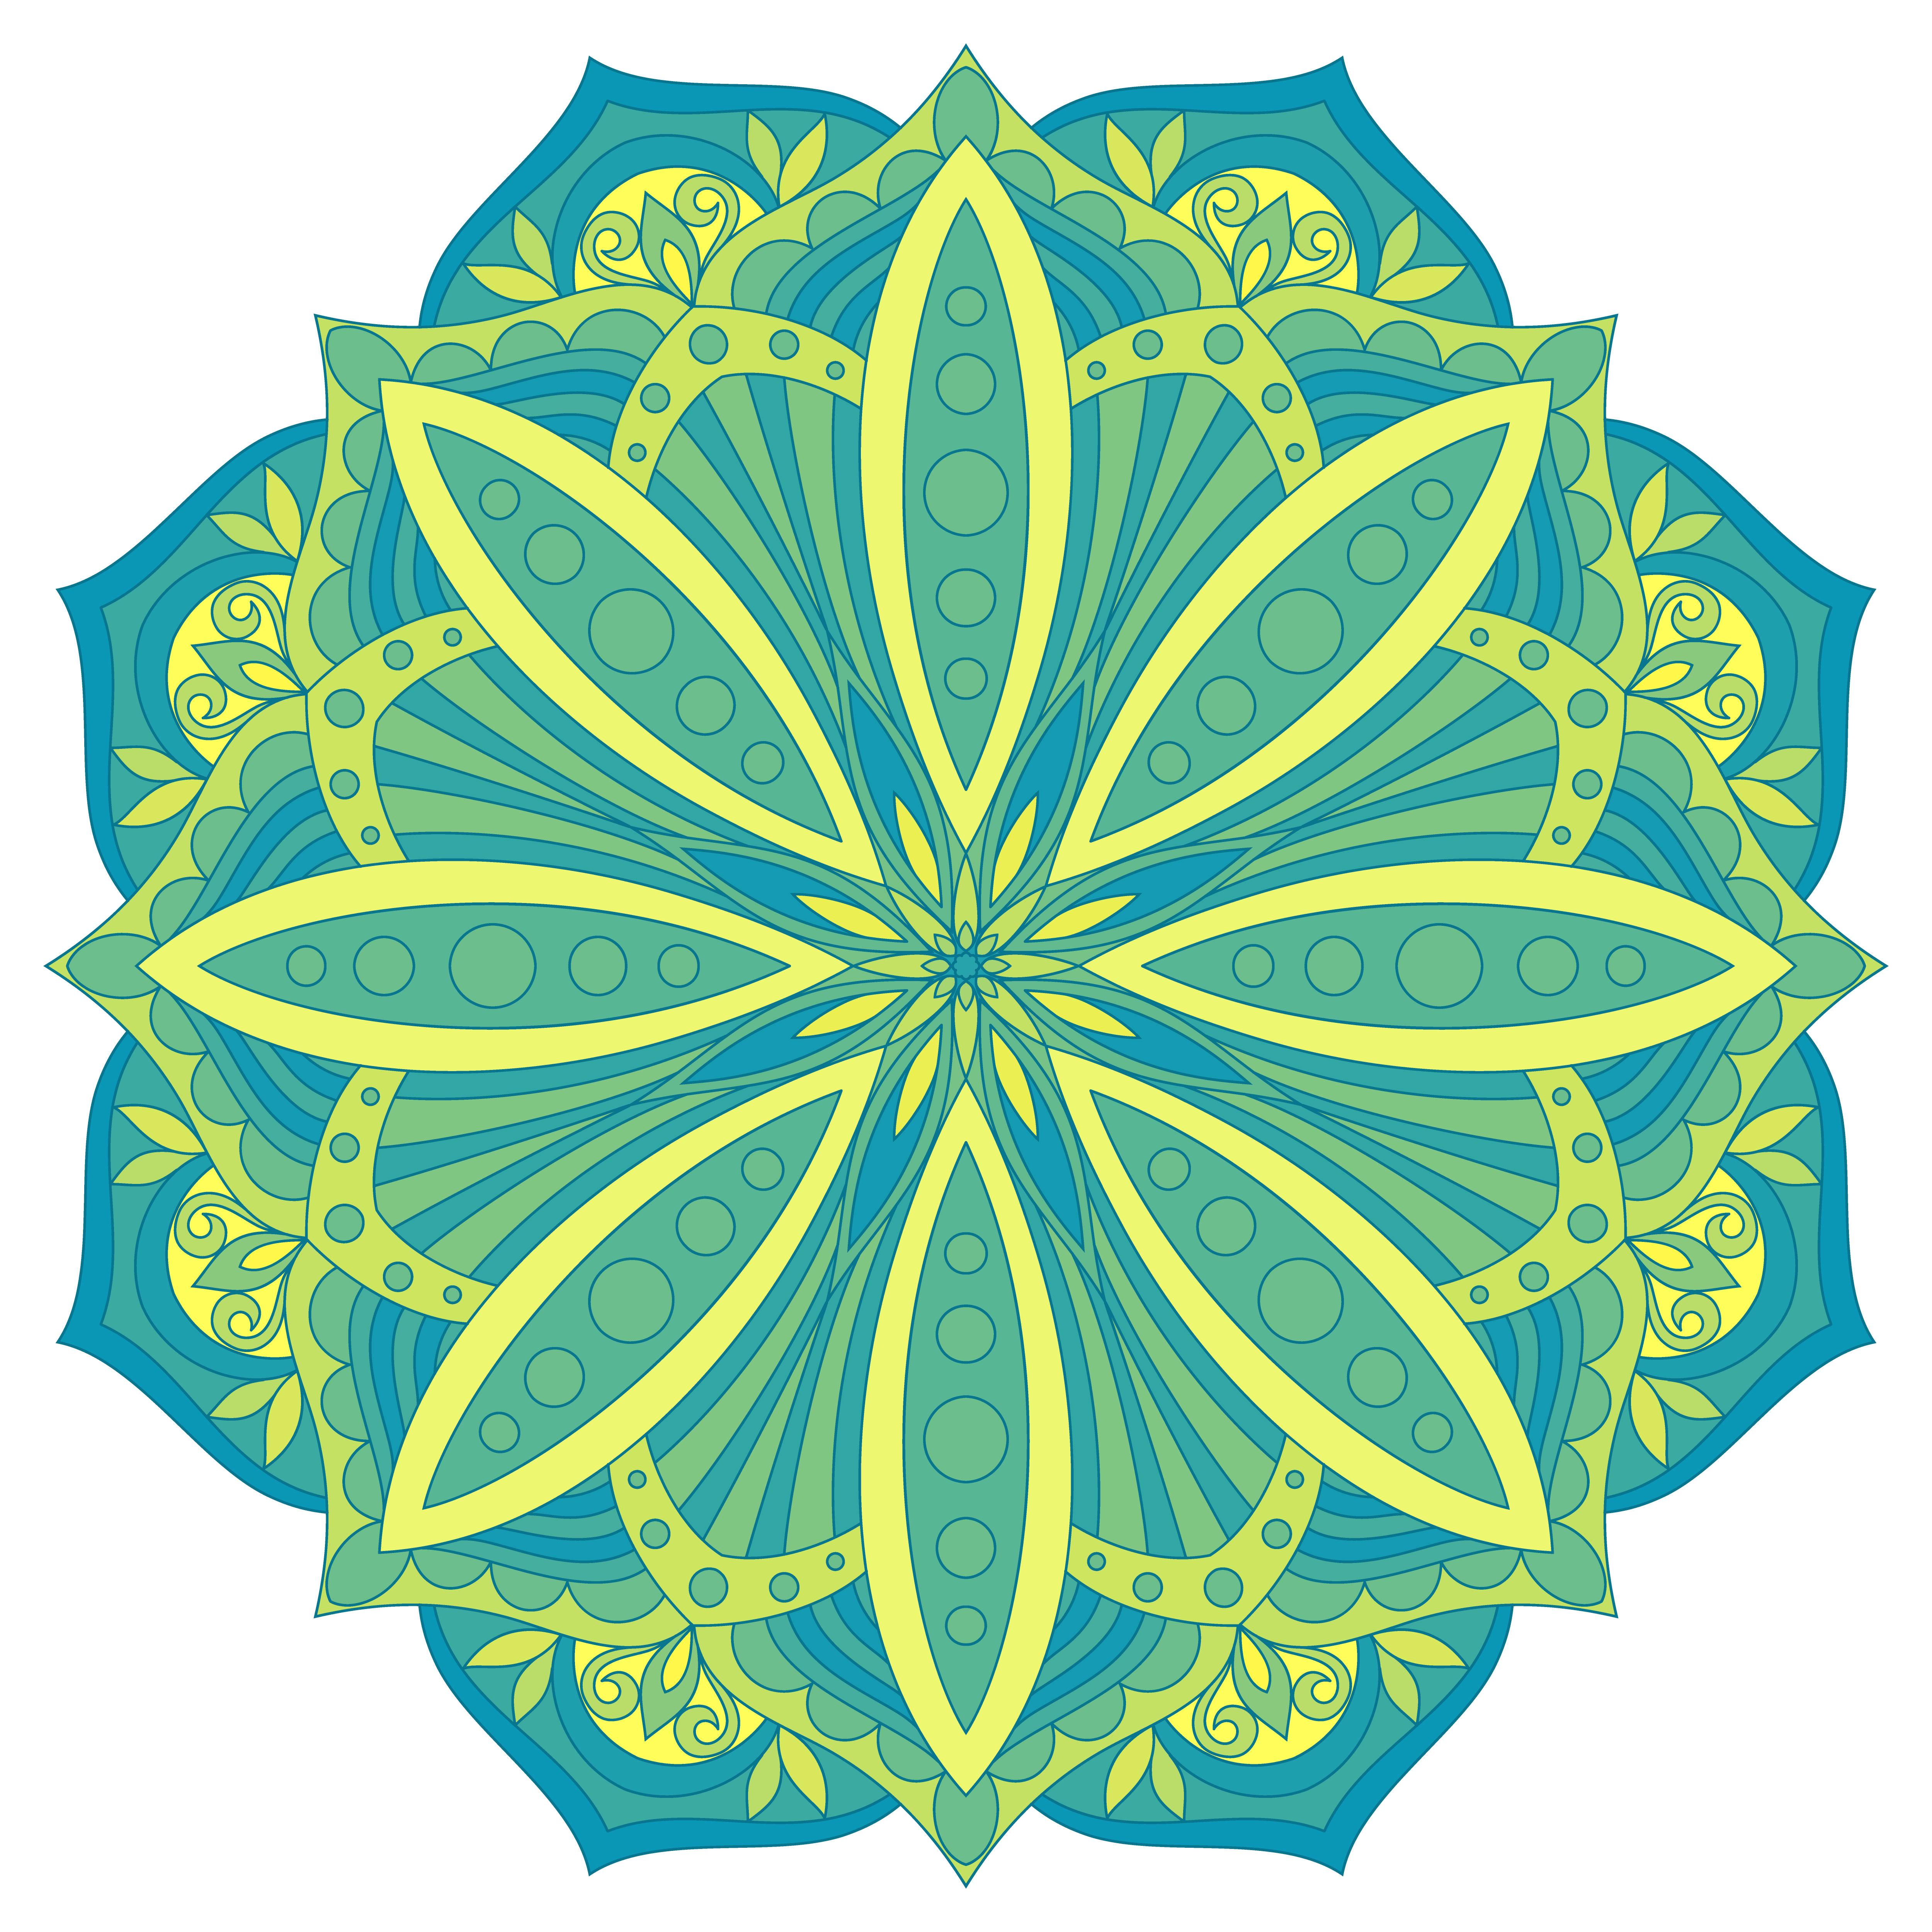 Abstract Round Logos: Ethnic Decorative Design Element. Colorful Vector Mandala